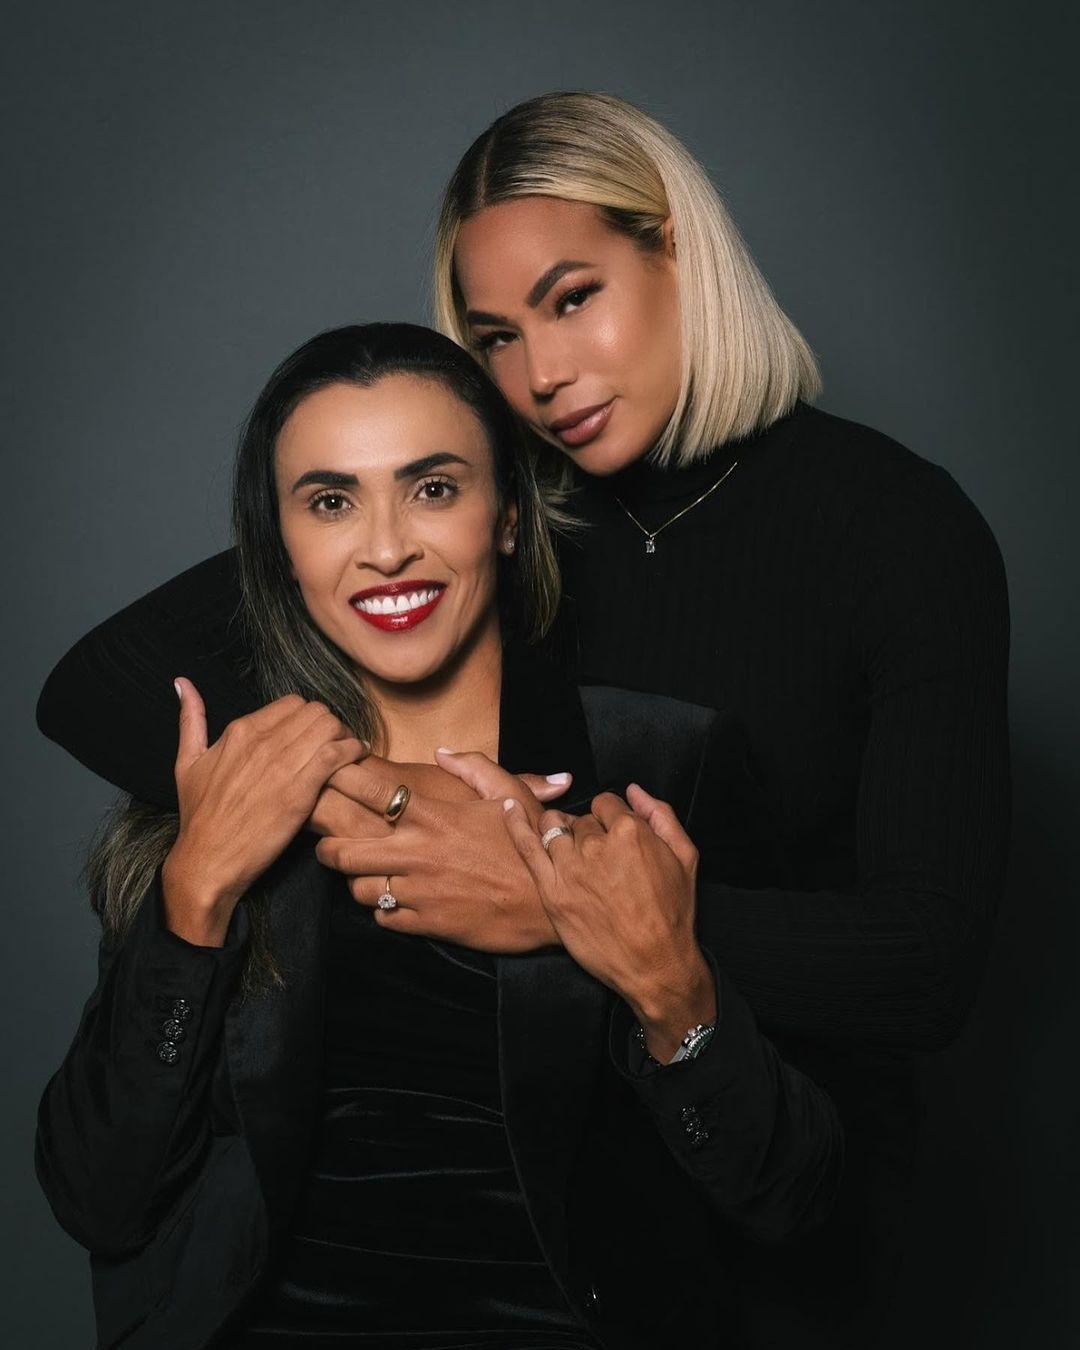 Marta Vieira da Silva, Toni Deion Pressley